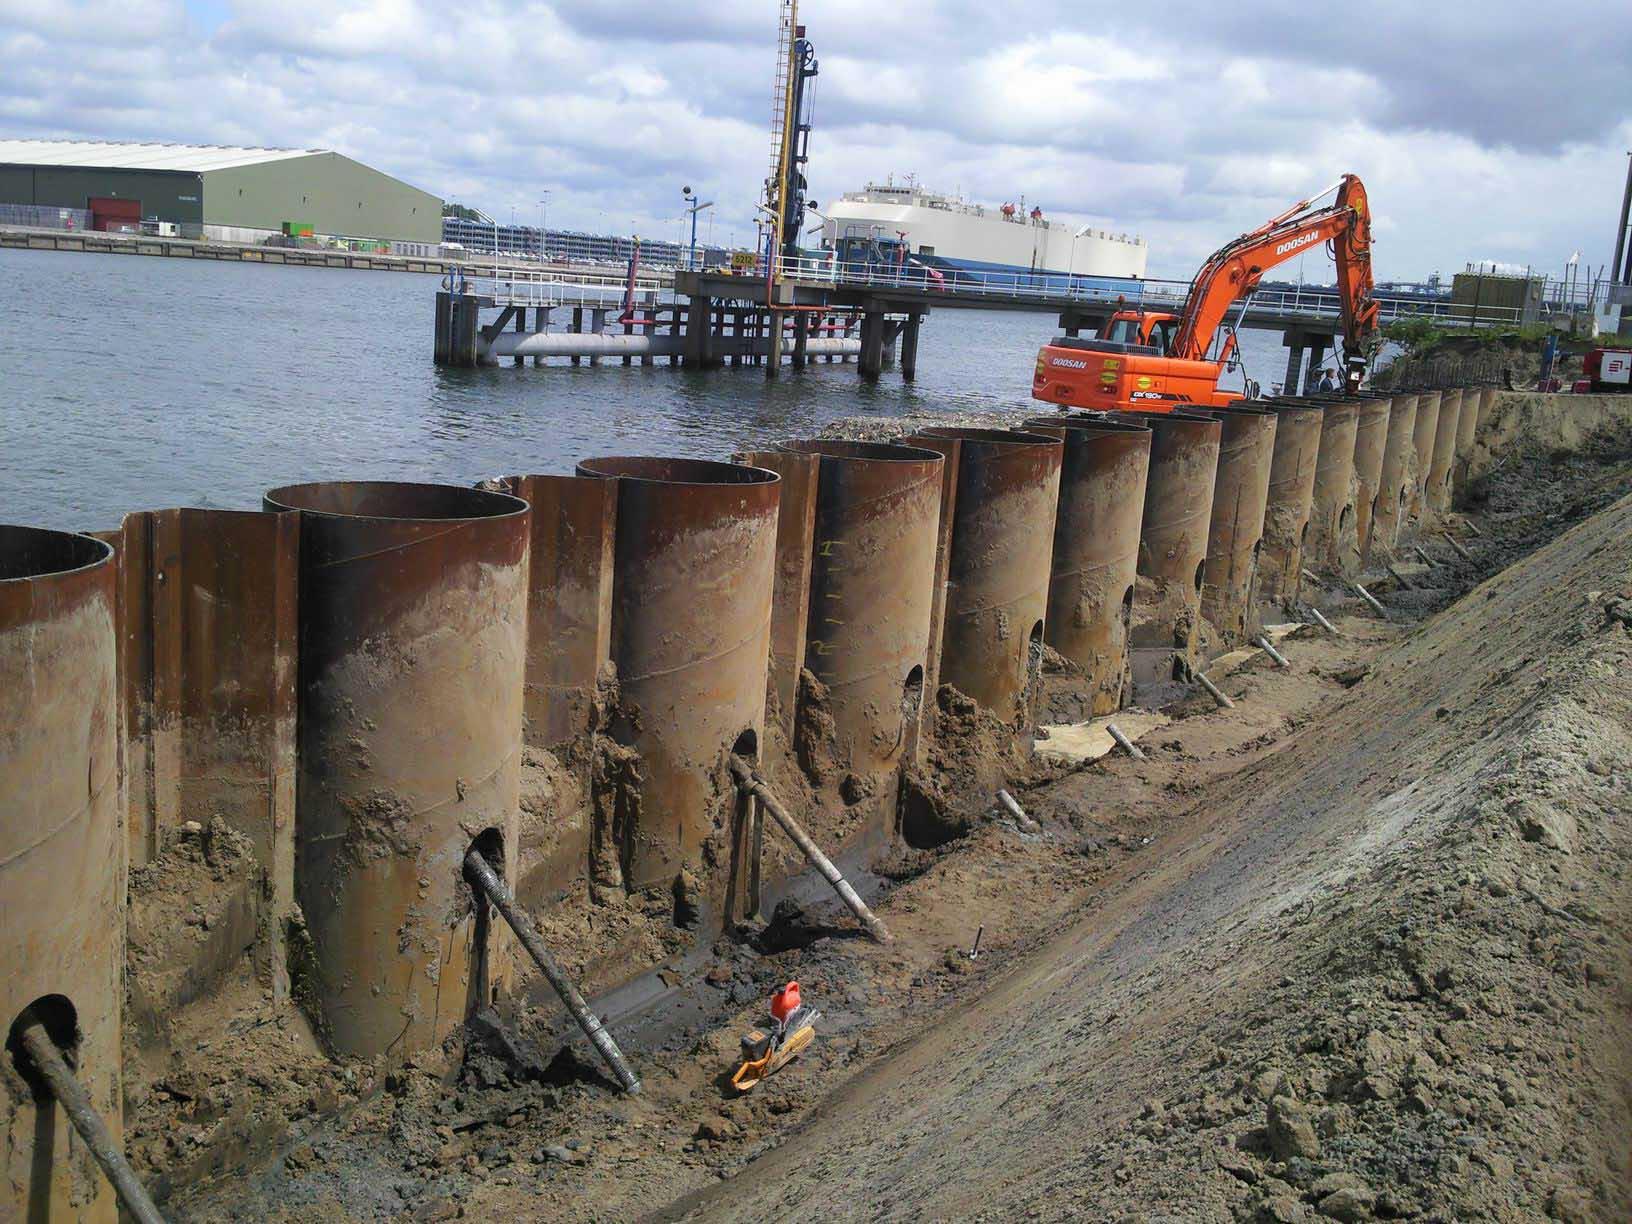 21.000 toneladas de tablestaca tubulares embarcadas al puerto de Manzanillo, México.